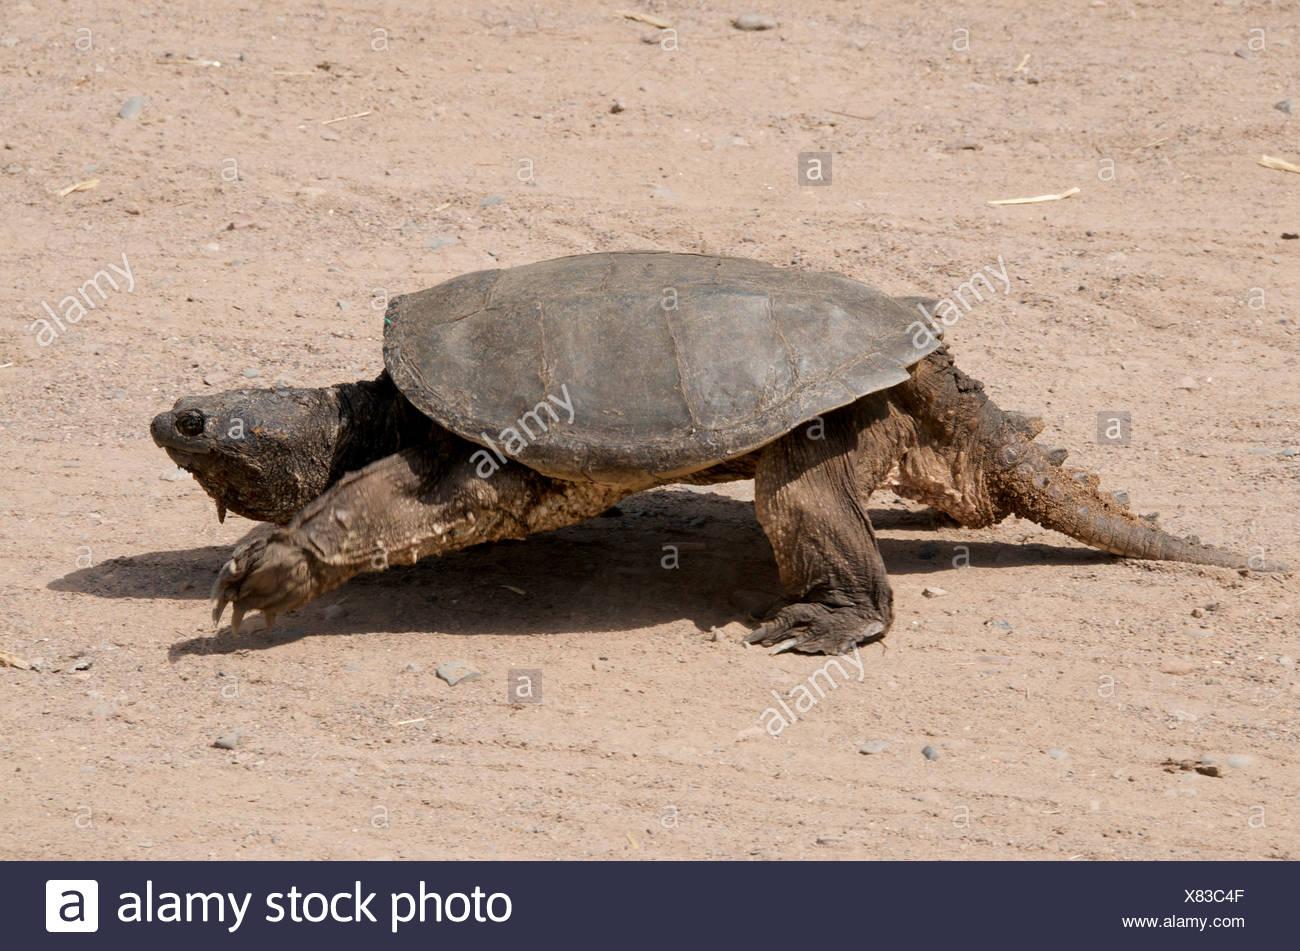 Walking Alligator Snapping Turtle (Macrochelys temminckii) Sandstone, Minnesota, North America, U.S.A. Stock Photo